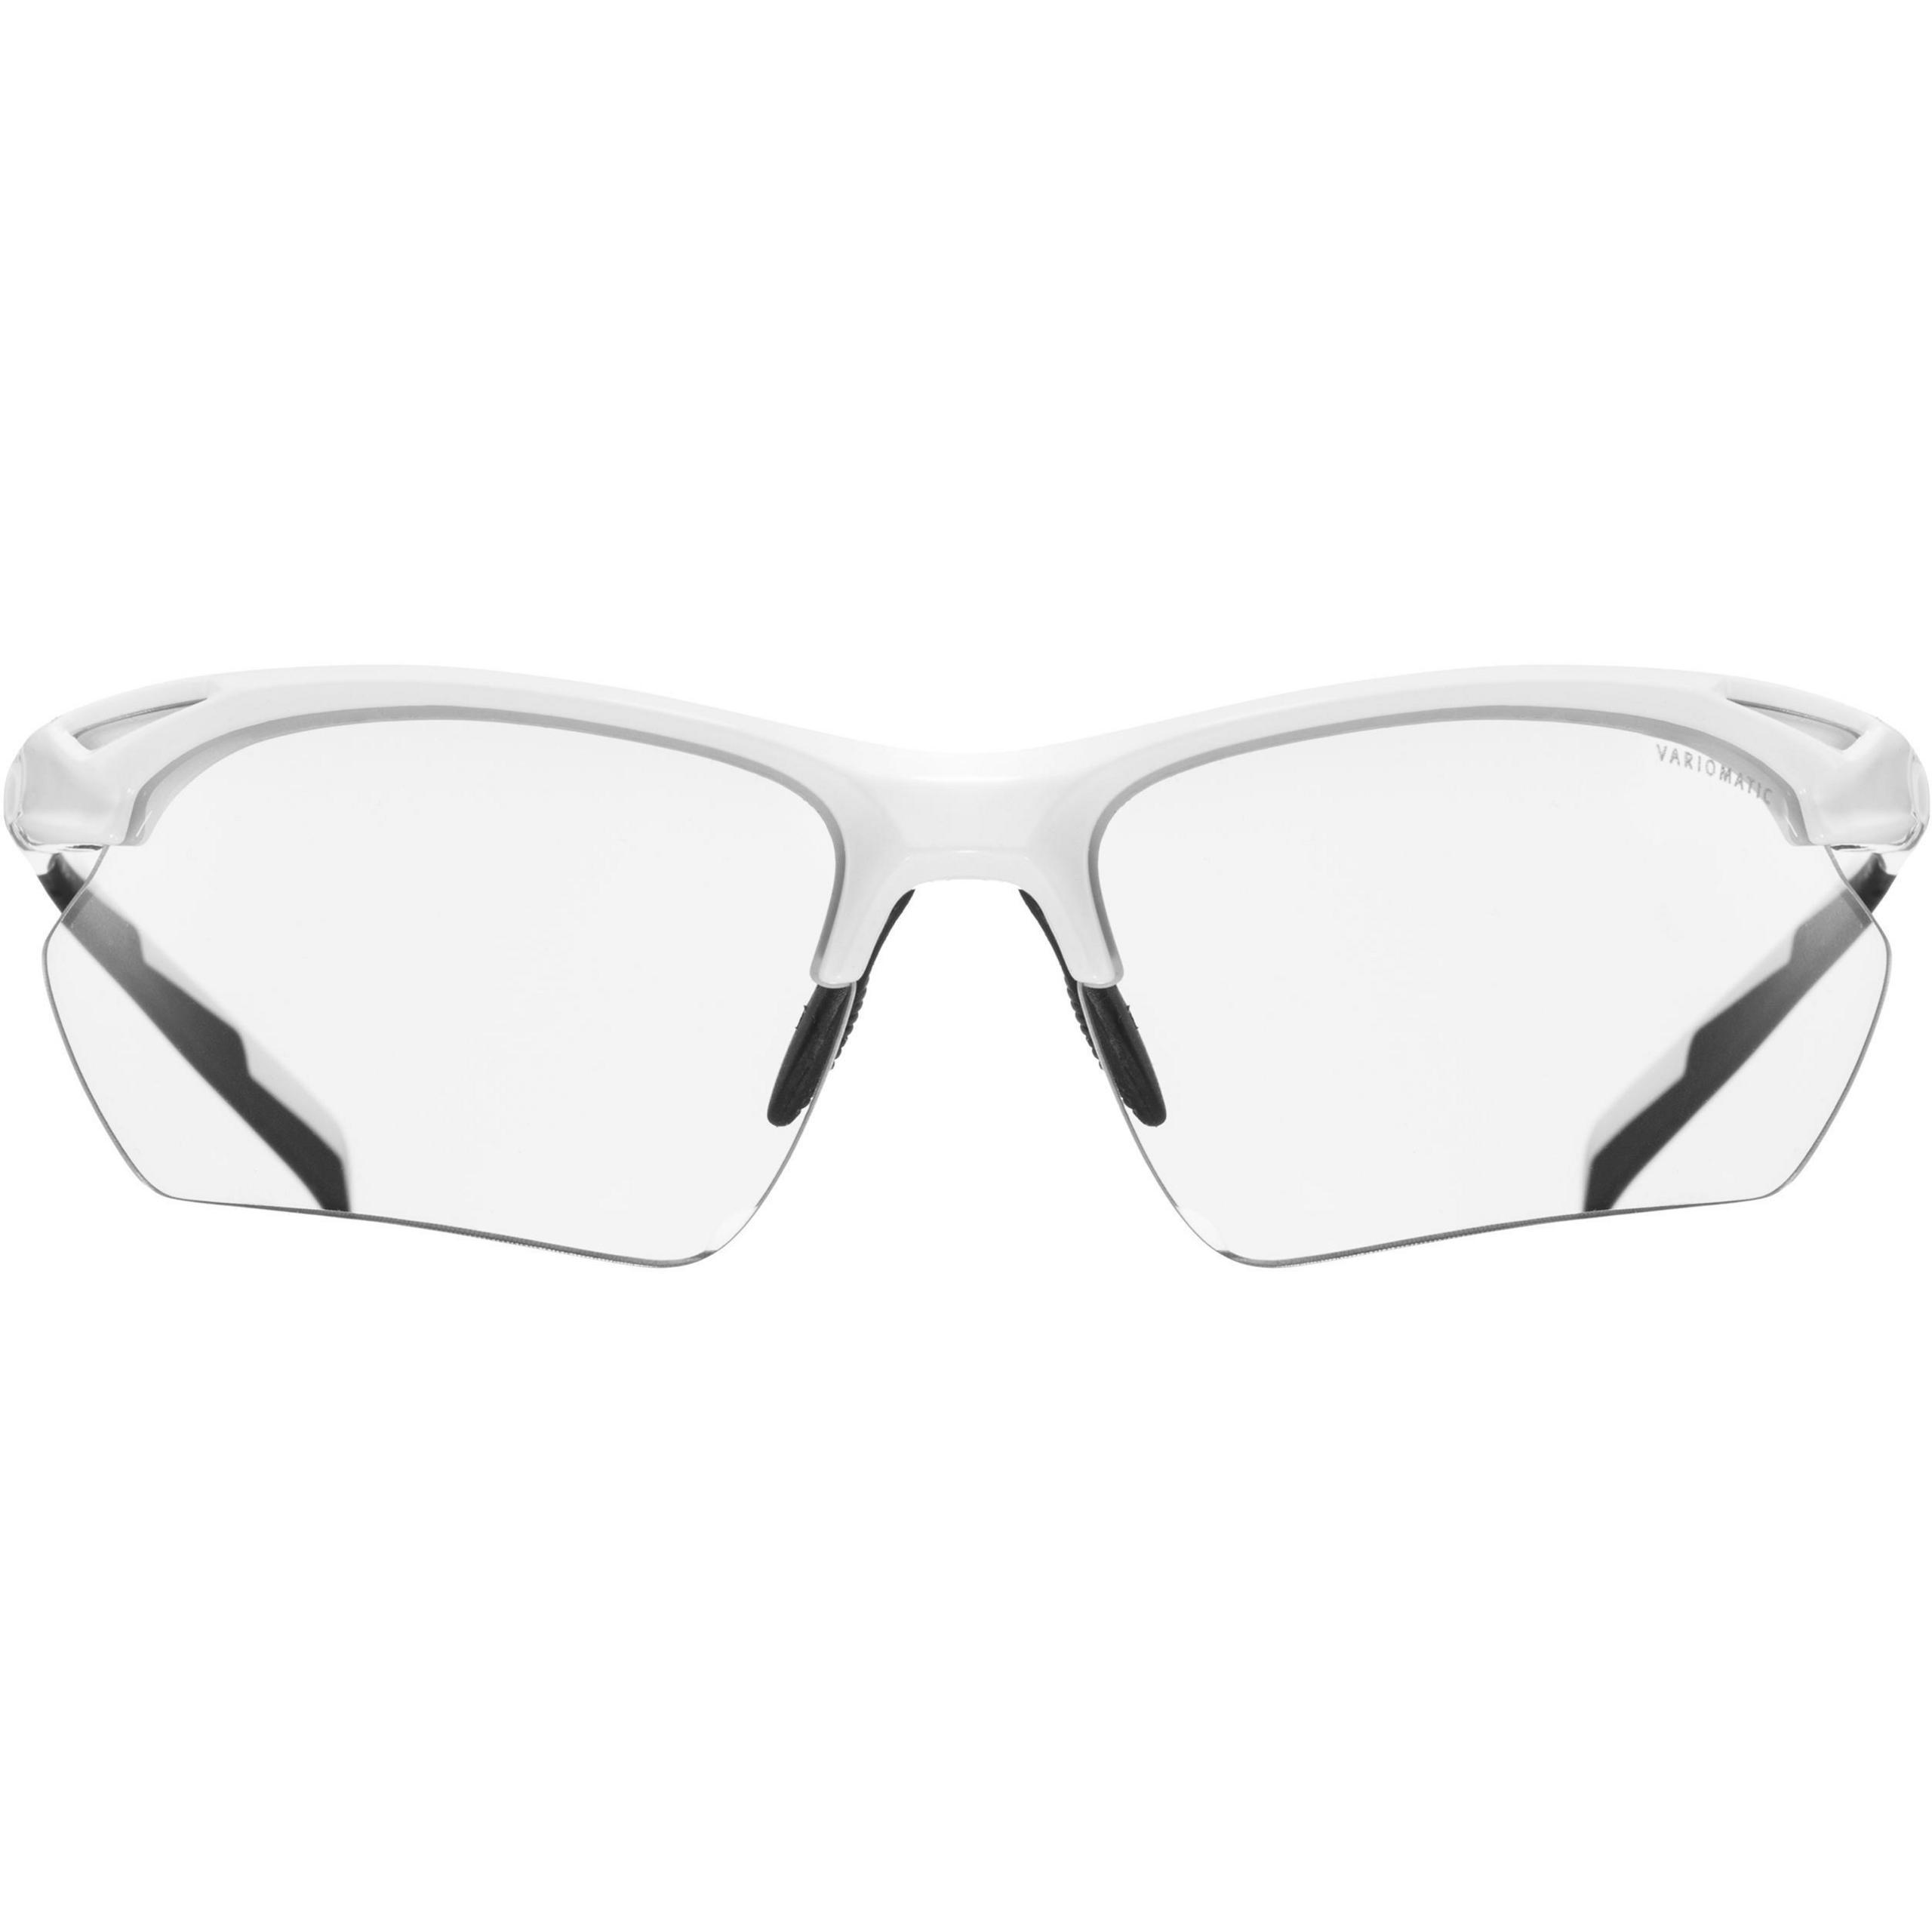 purple pink//smoke lunettes de sport Adulte unisexe Uvex sportstyle 802 small vario one size